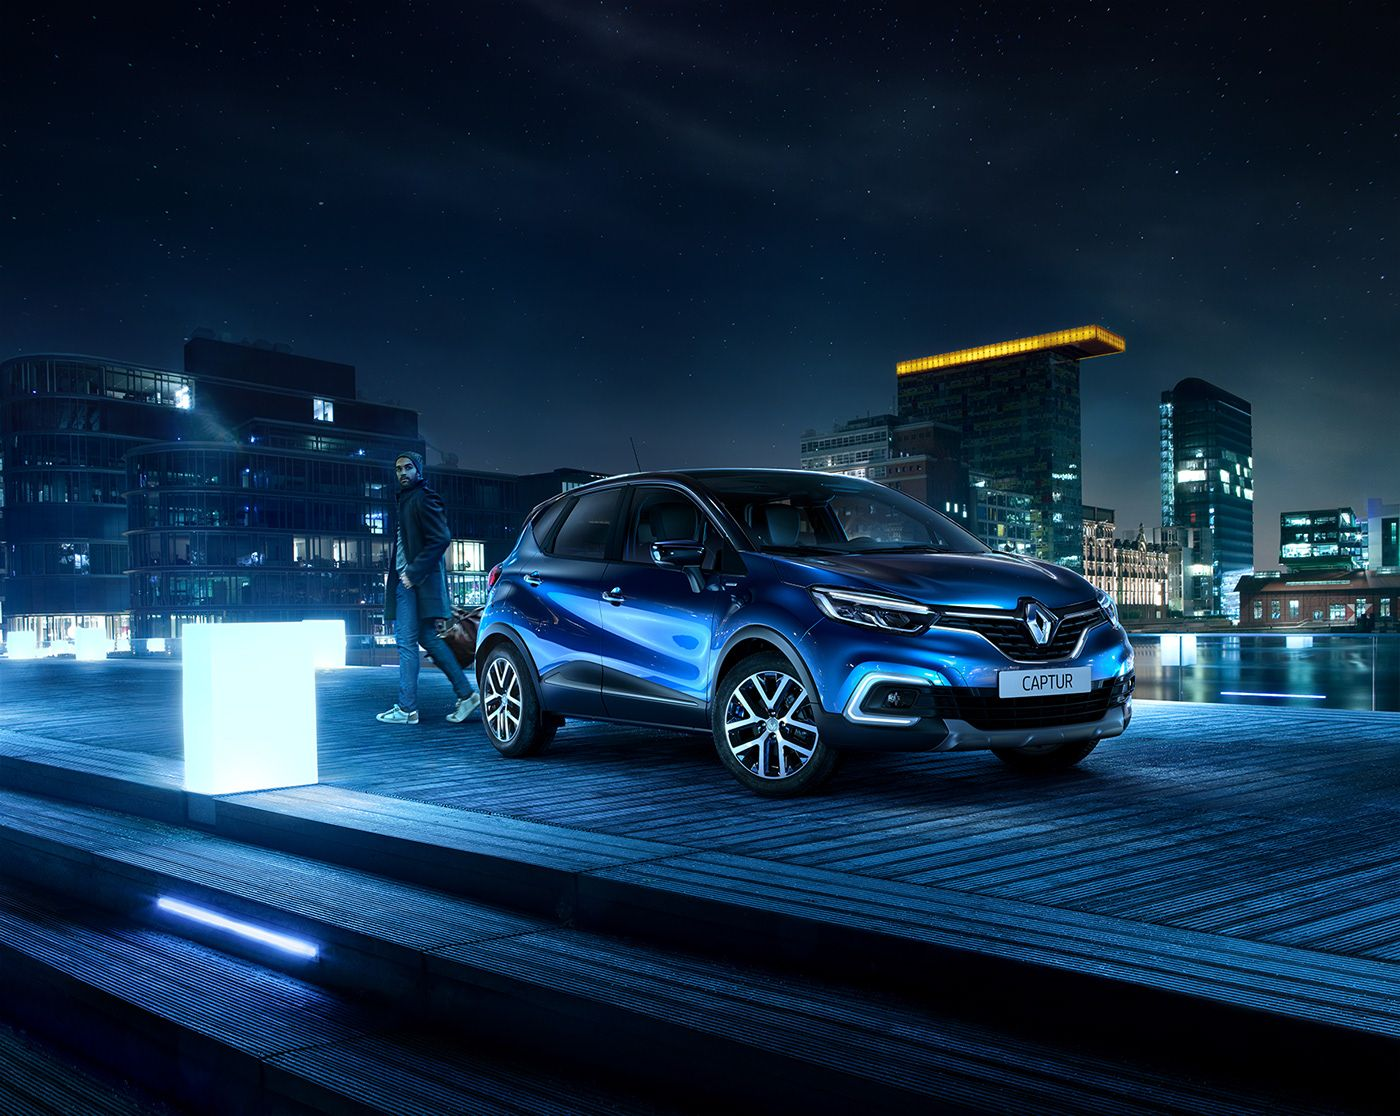 Marin Ponsar On Behance Renault Captur Renault Renault Clio